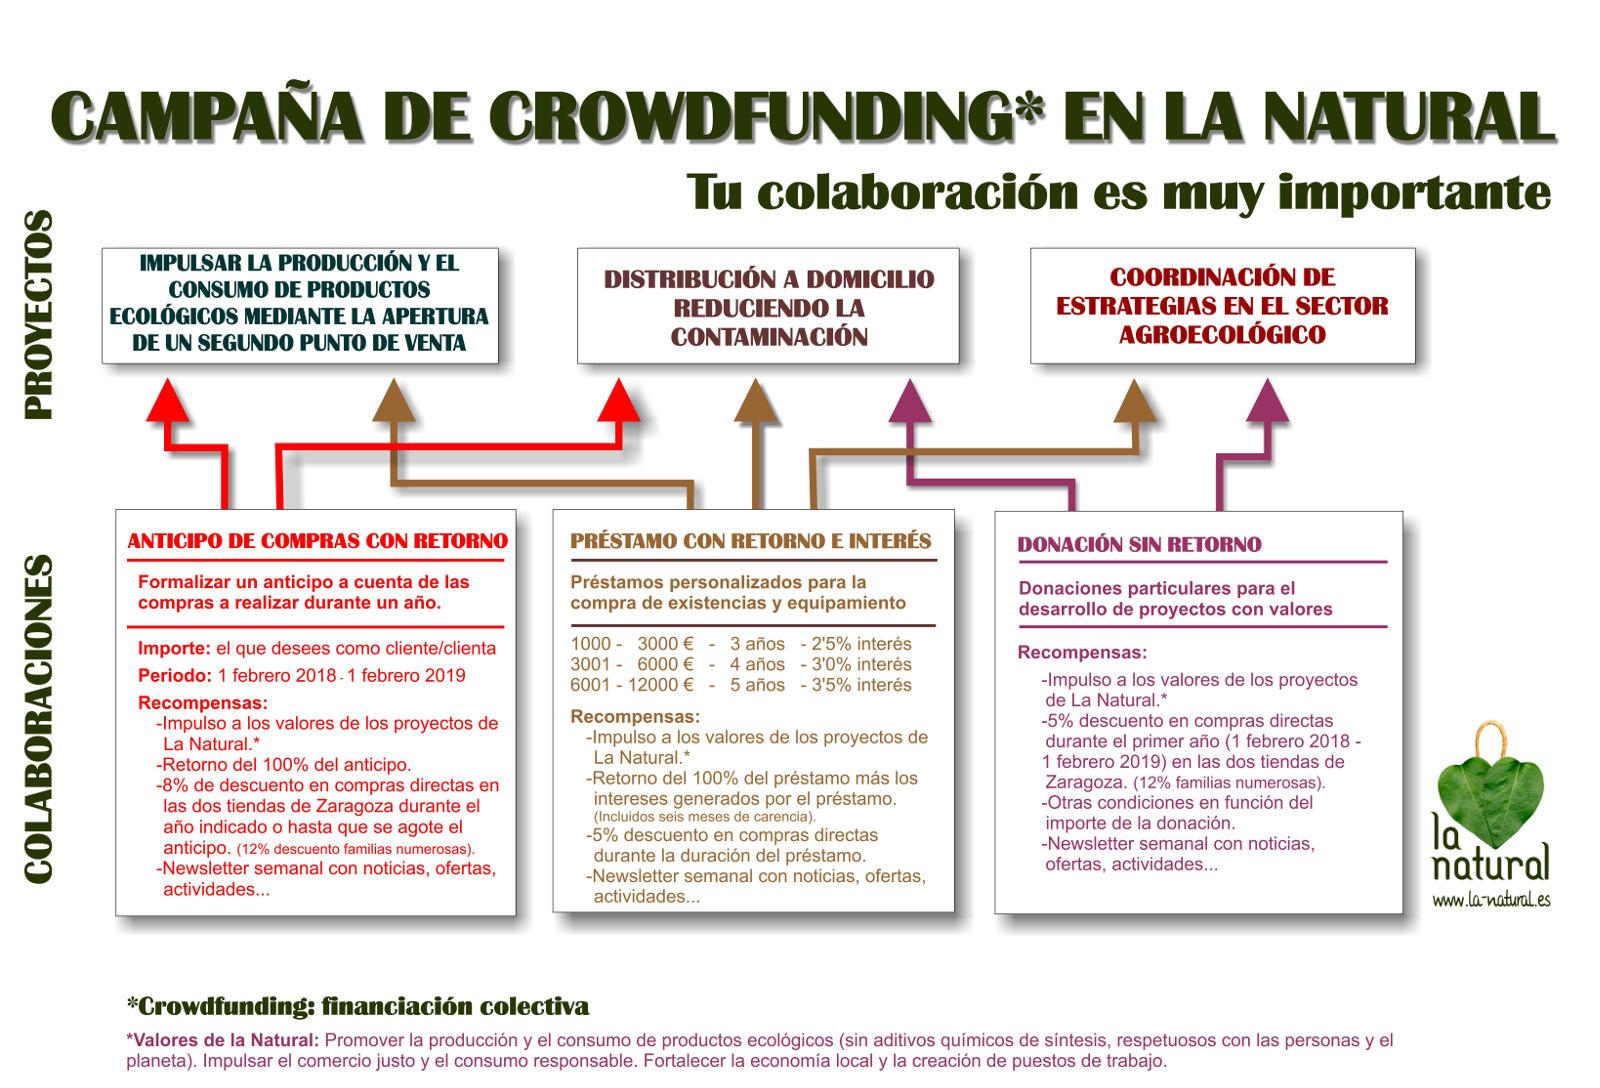 Campaña crowdfunding